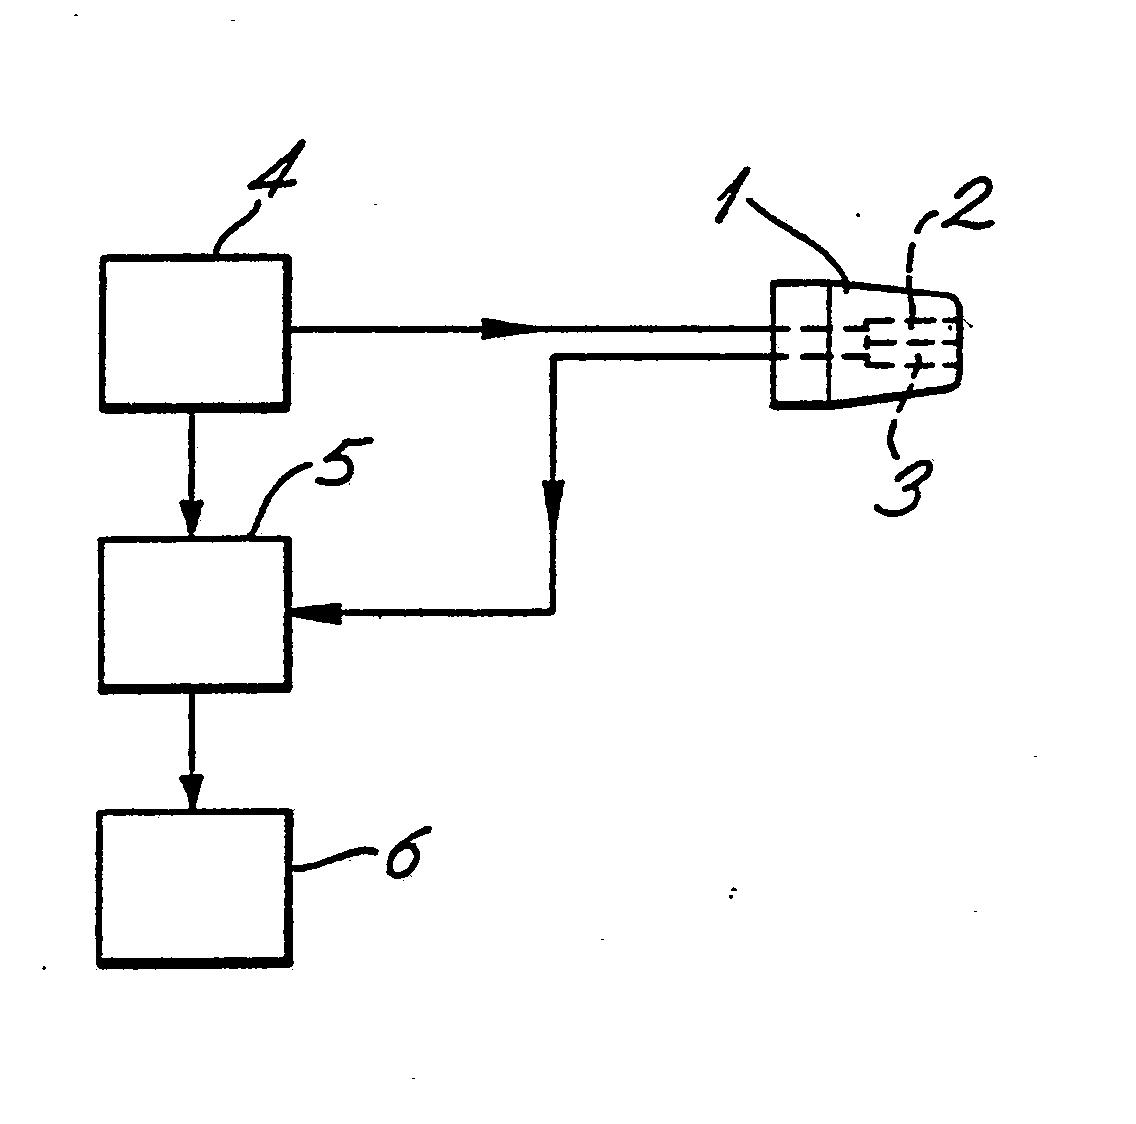 伴音块ad52582a电路图